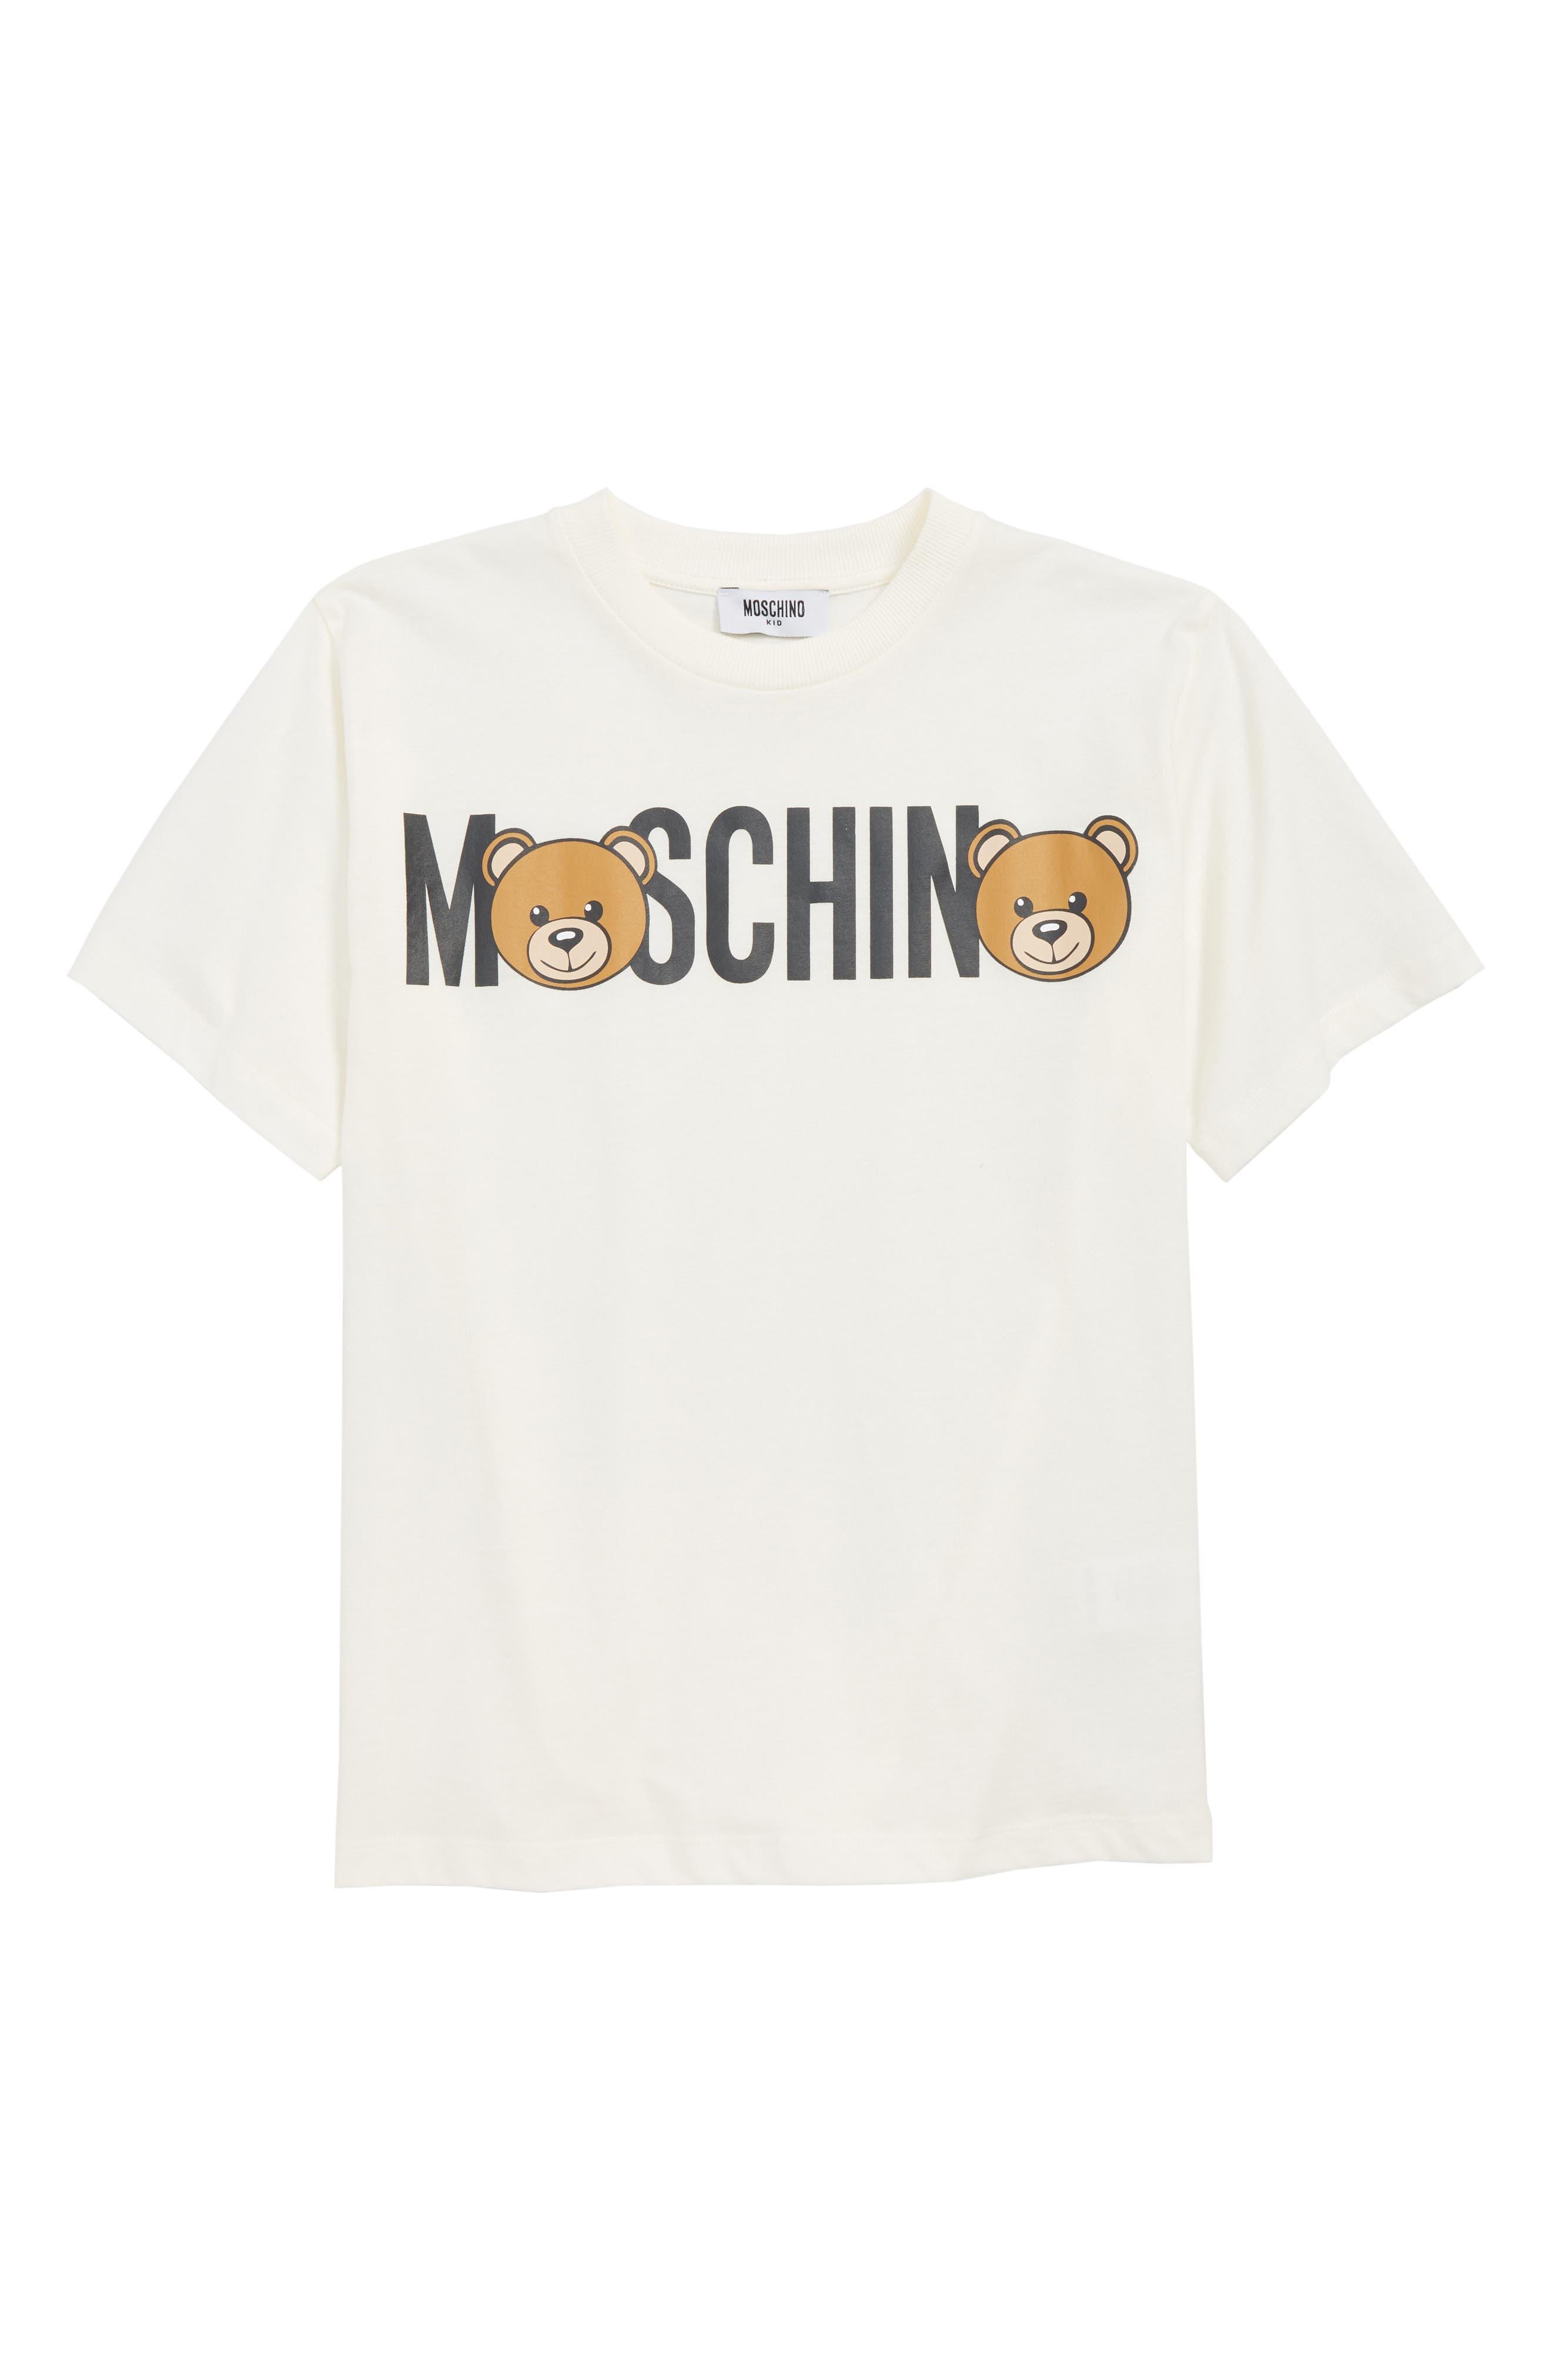 Toddler Moschino Teddy Bear Logo TShirt Size 4Y  White